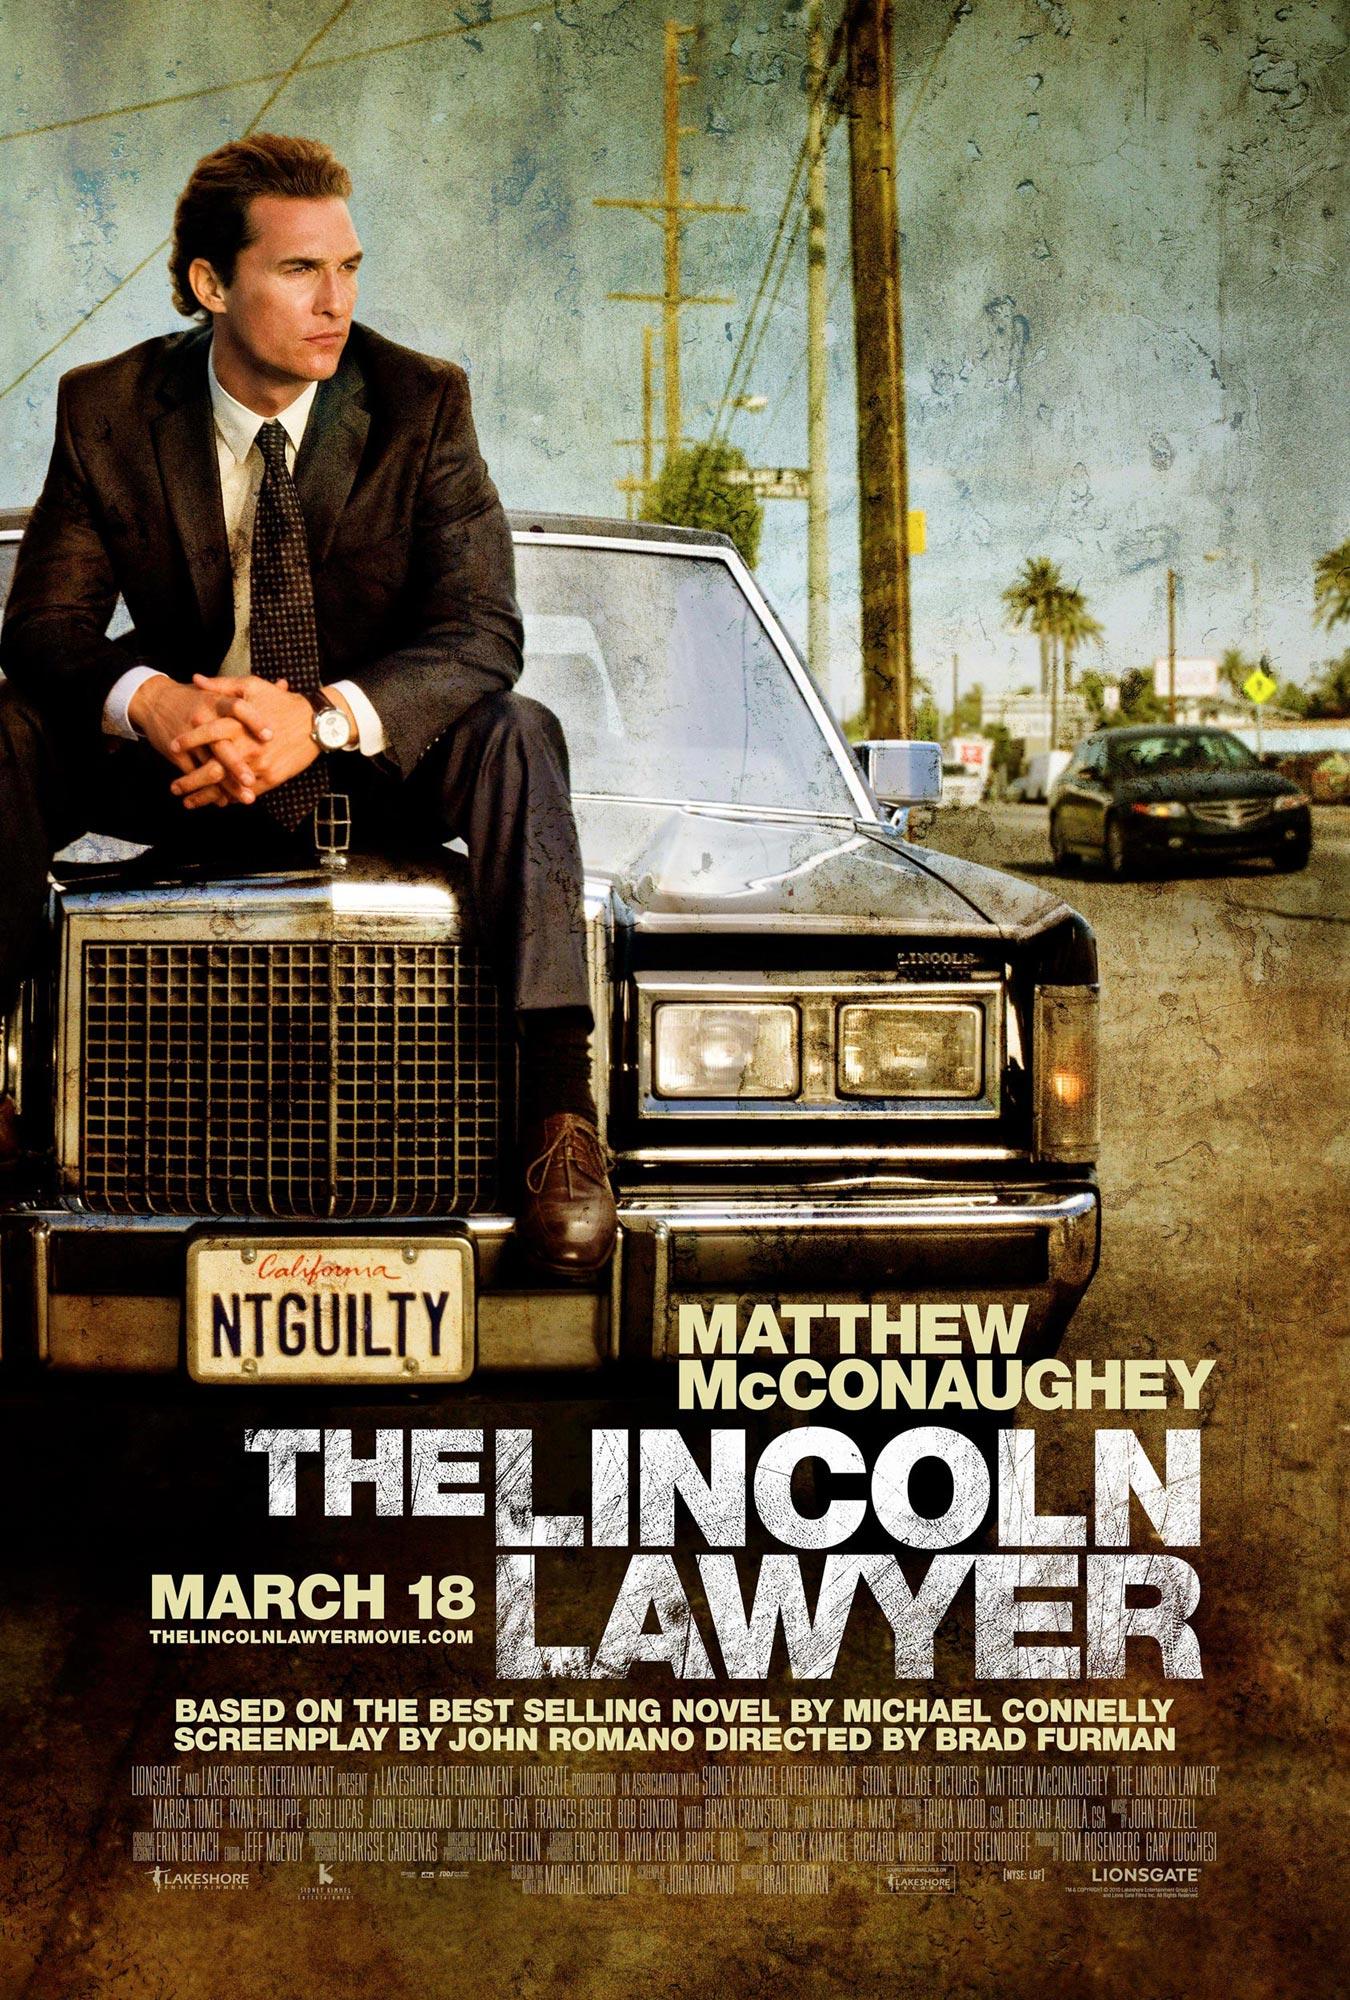 The Lincoln Lawyer Poster - FilmoFilia